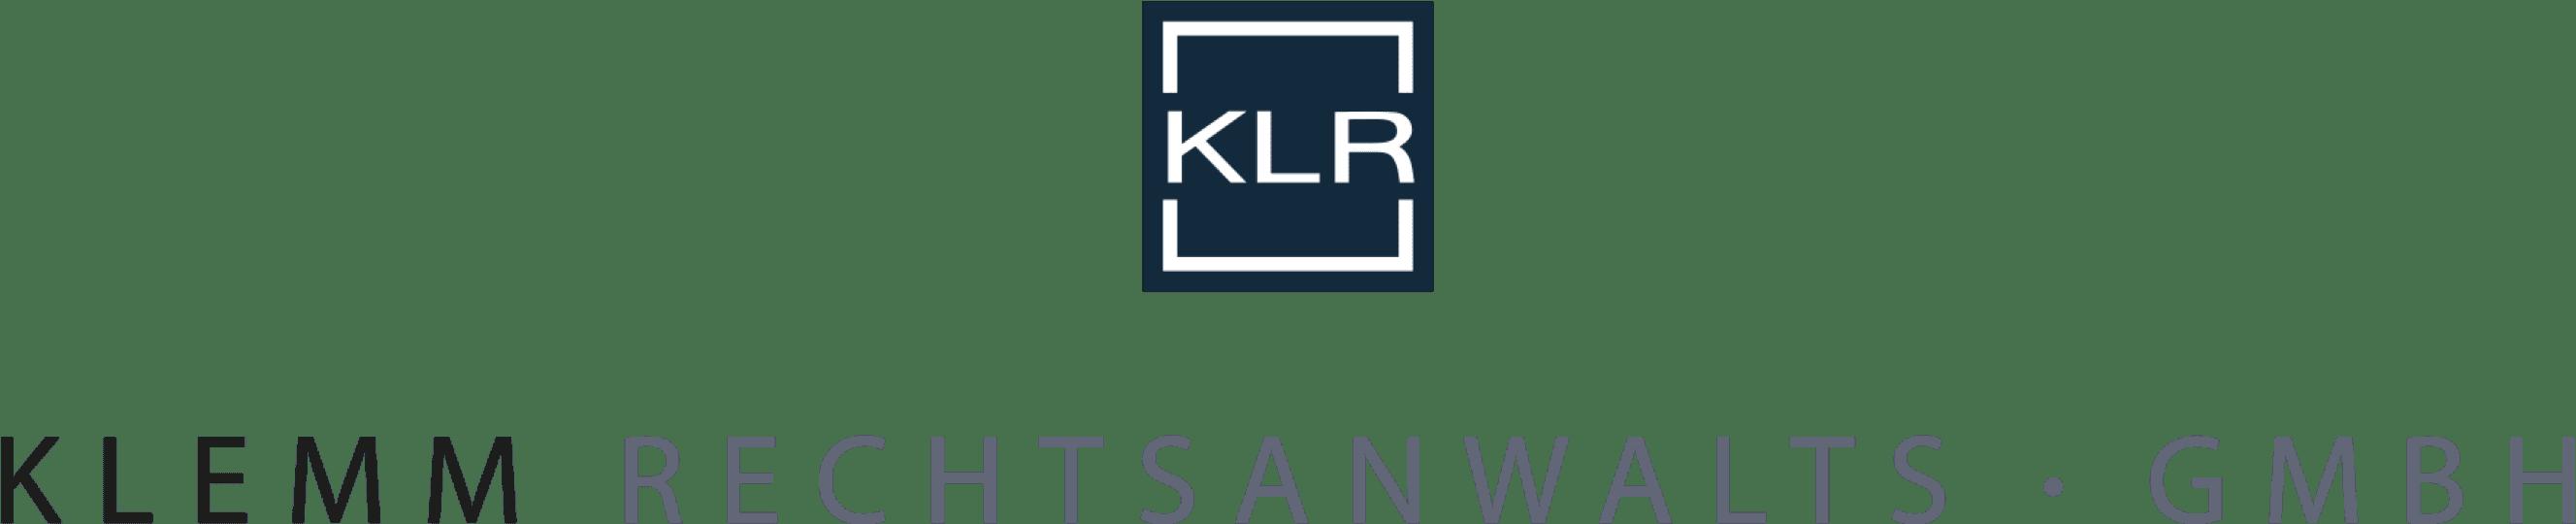 Klemm Rechtsanwalts-GmbH